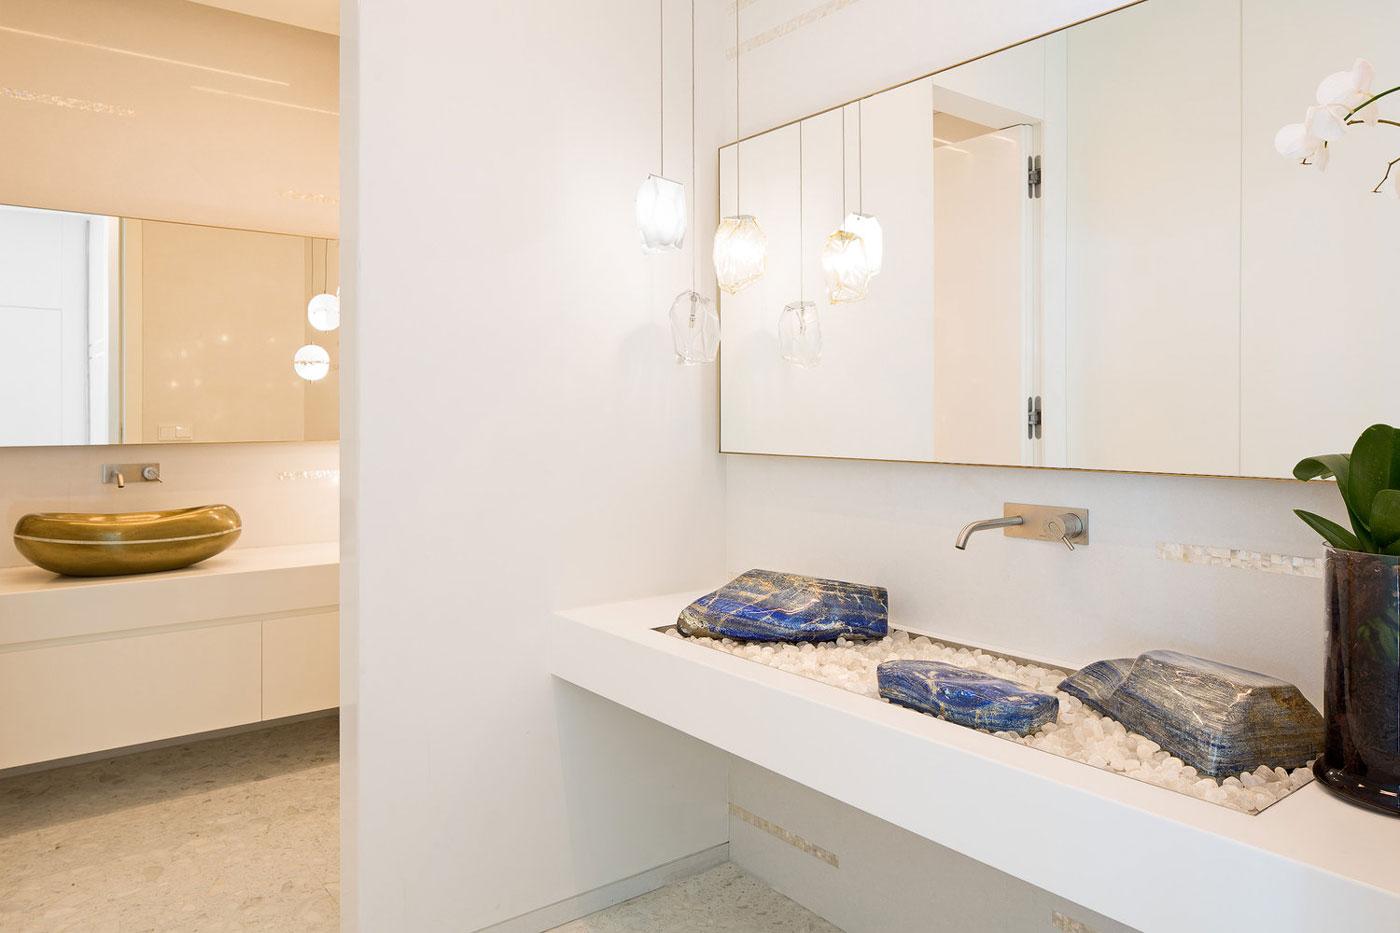 Bathroom sink with rocks & stones